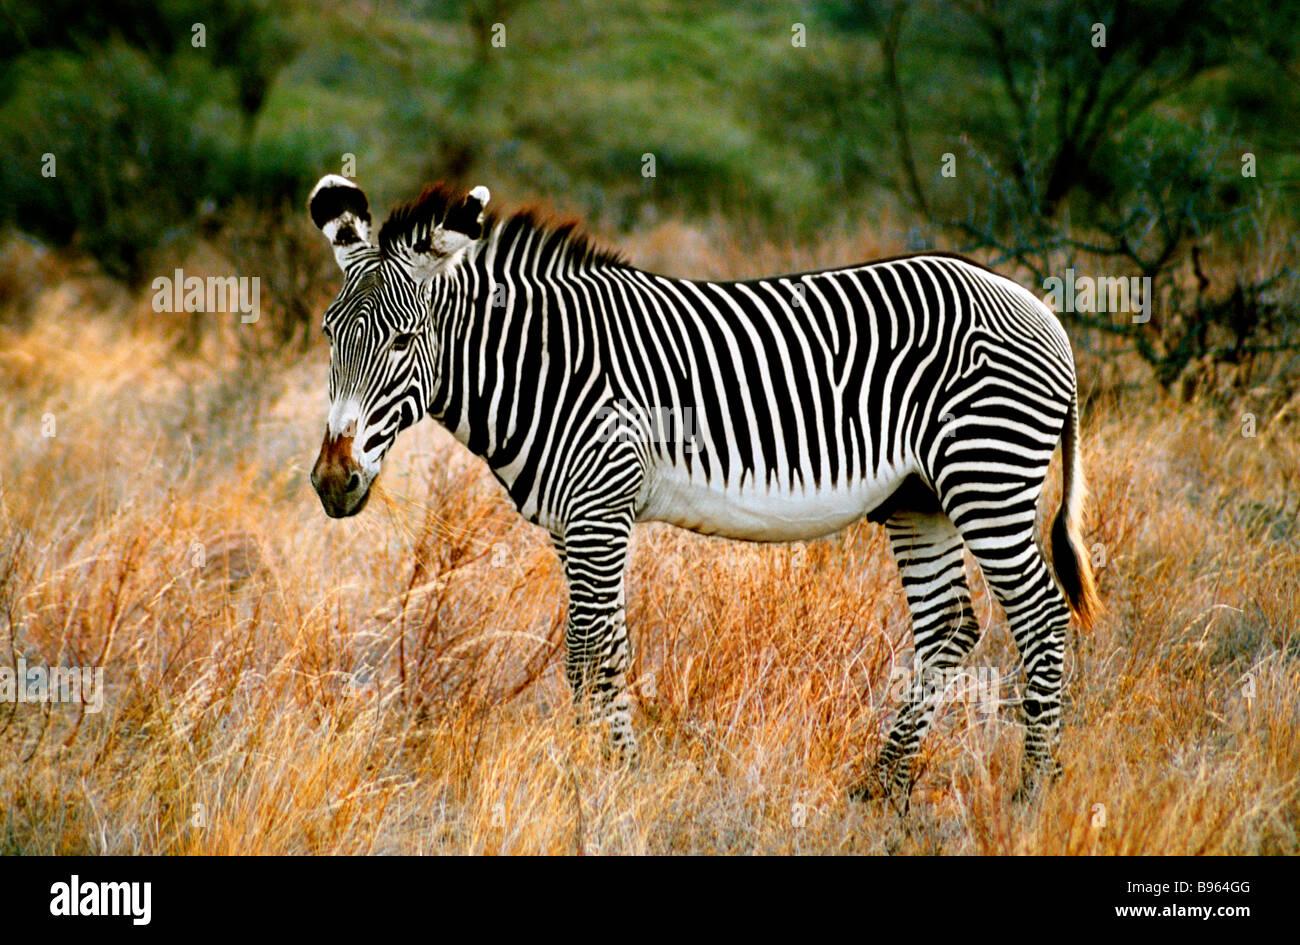 Equus grevyi nel giardino KENYA AFRICA Immagini Stock